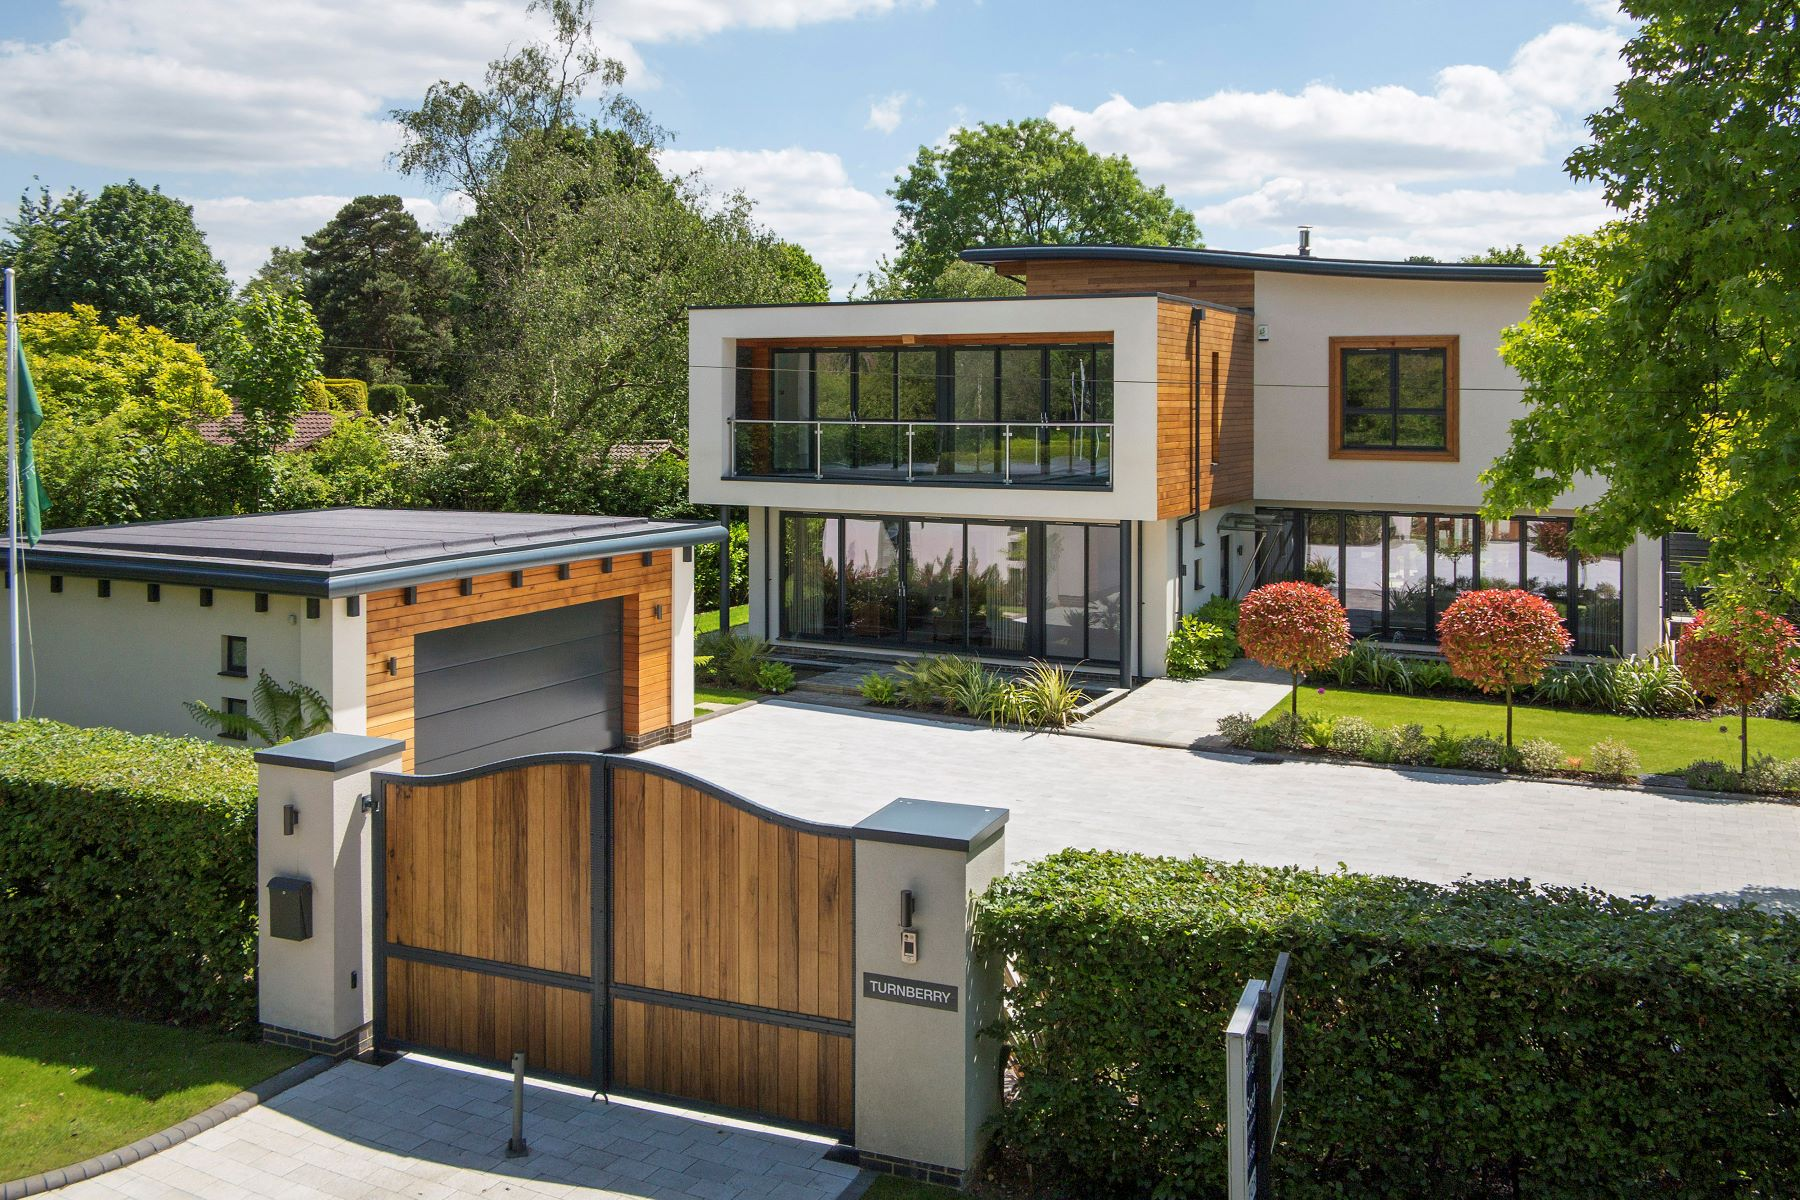 Single Family Homes for Sale at Turnberry Sandy Lane Other England, England KT29 6NE United Kingdom